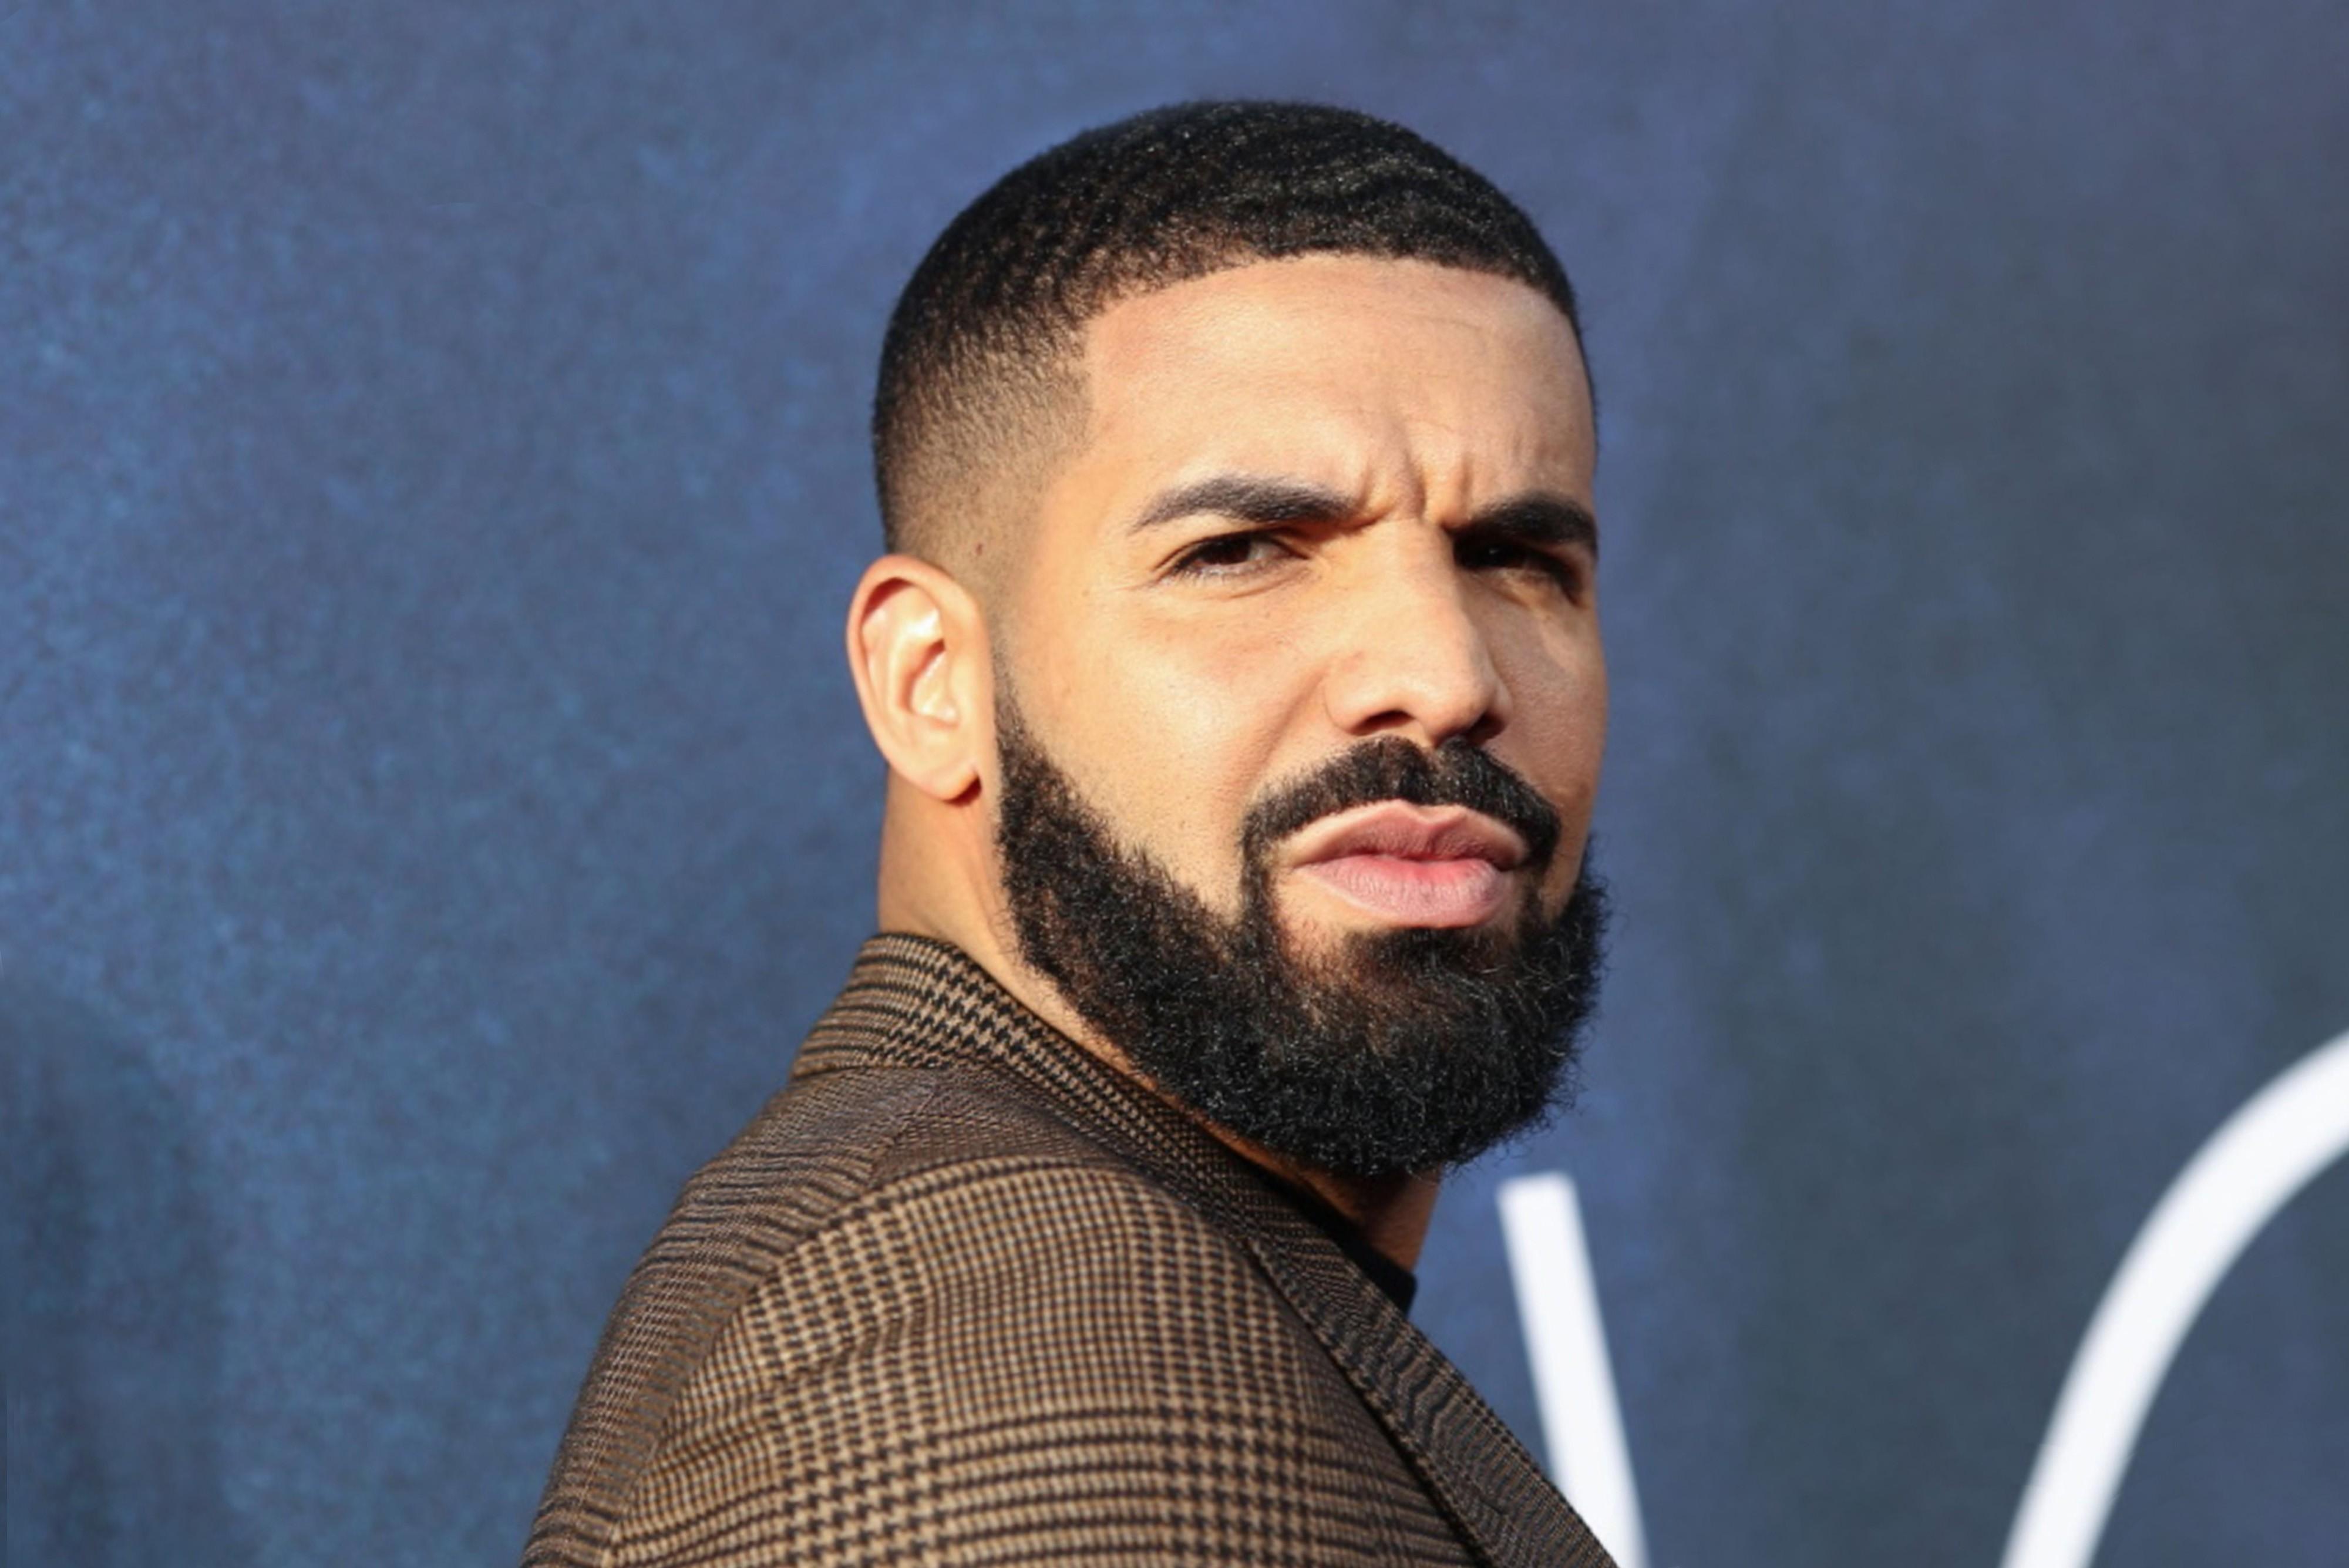 Drake long beard for stylish look.